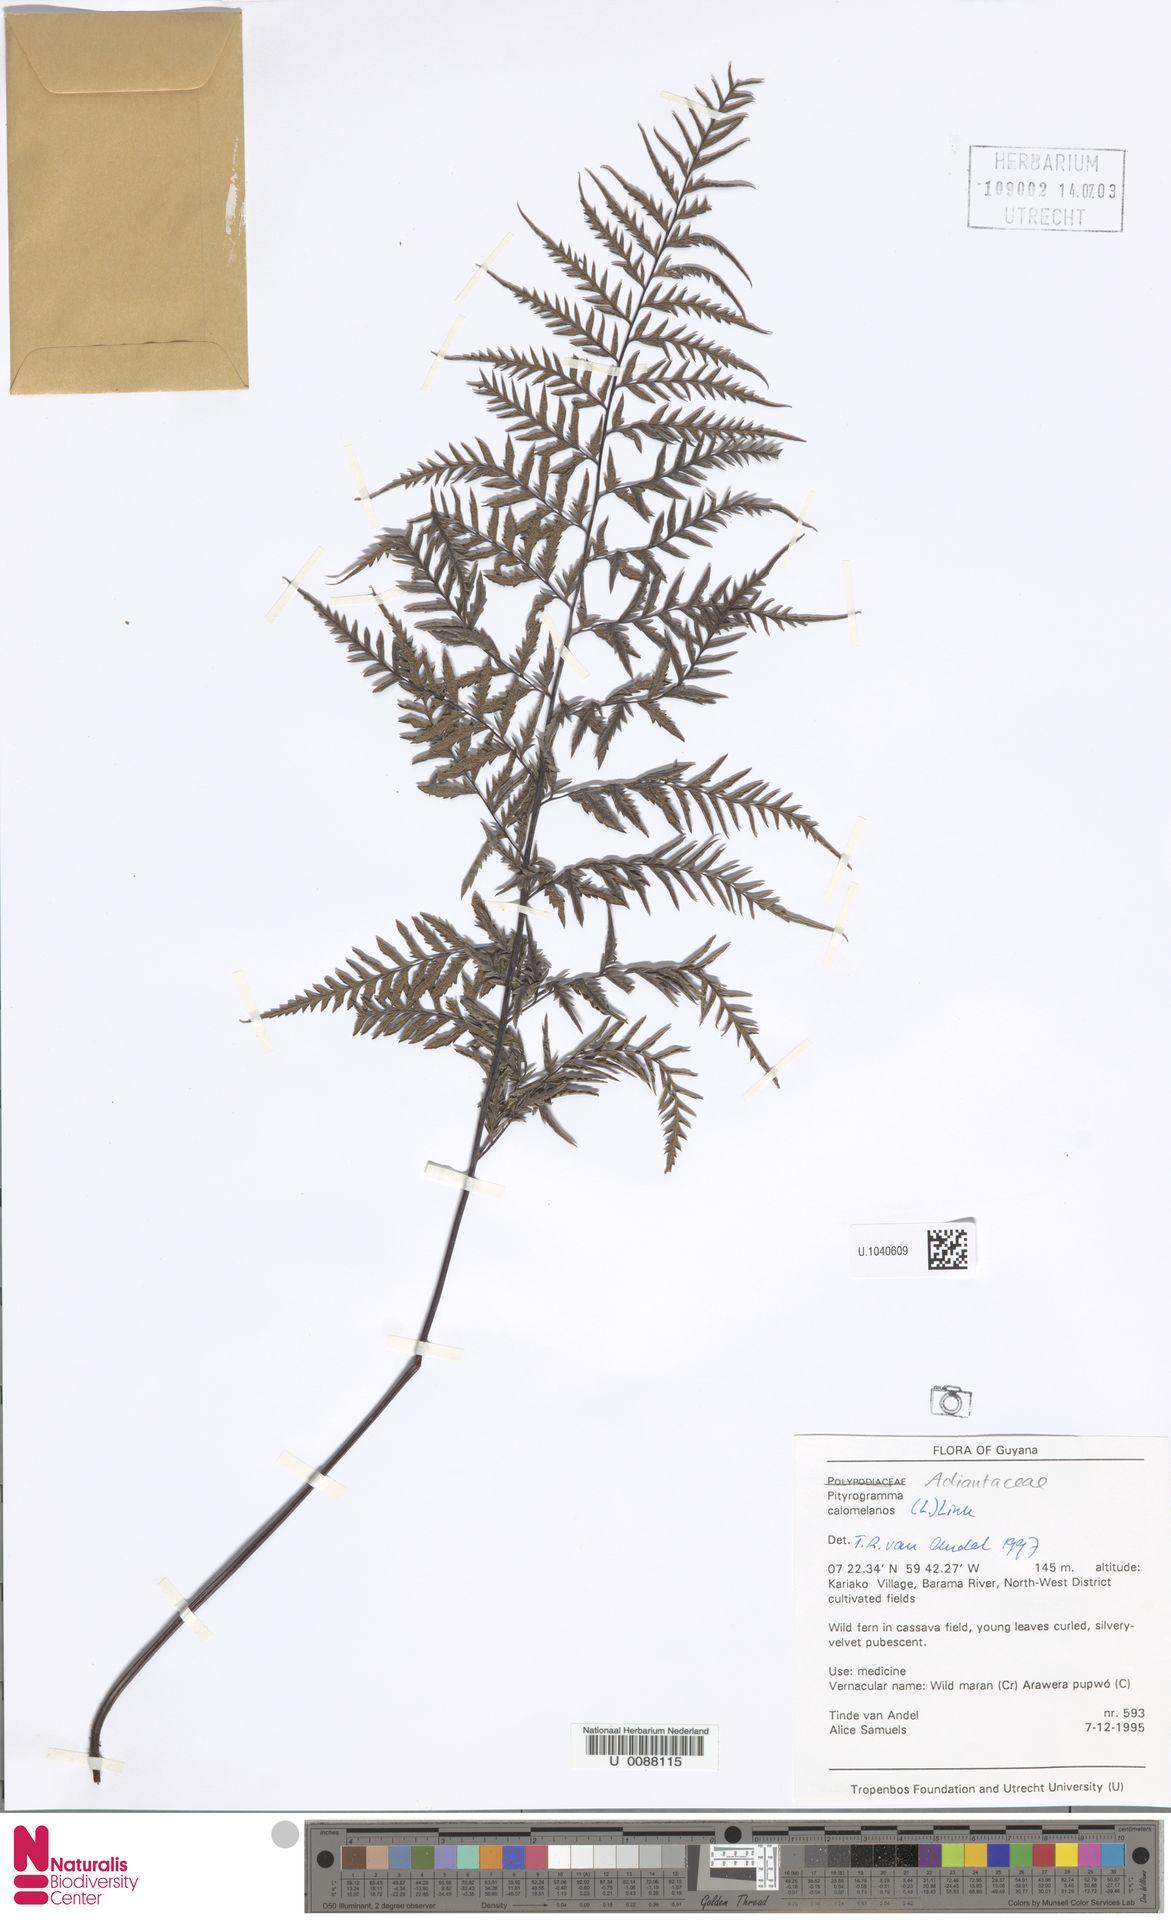 U.1040609 | Pityrogramma calomelanos (L.) Link